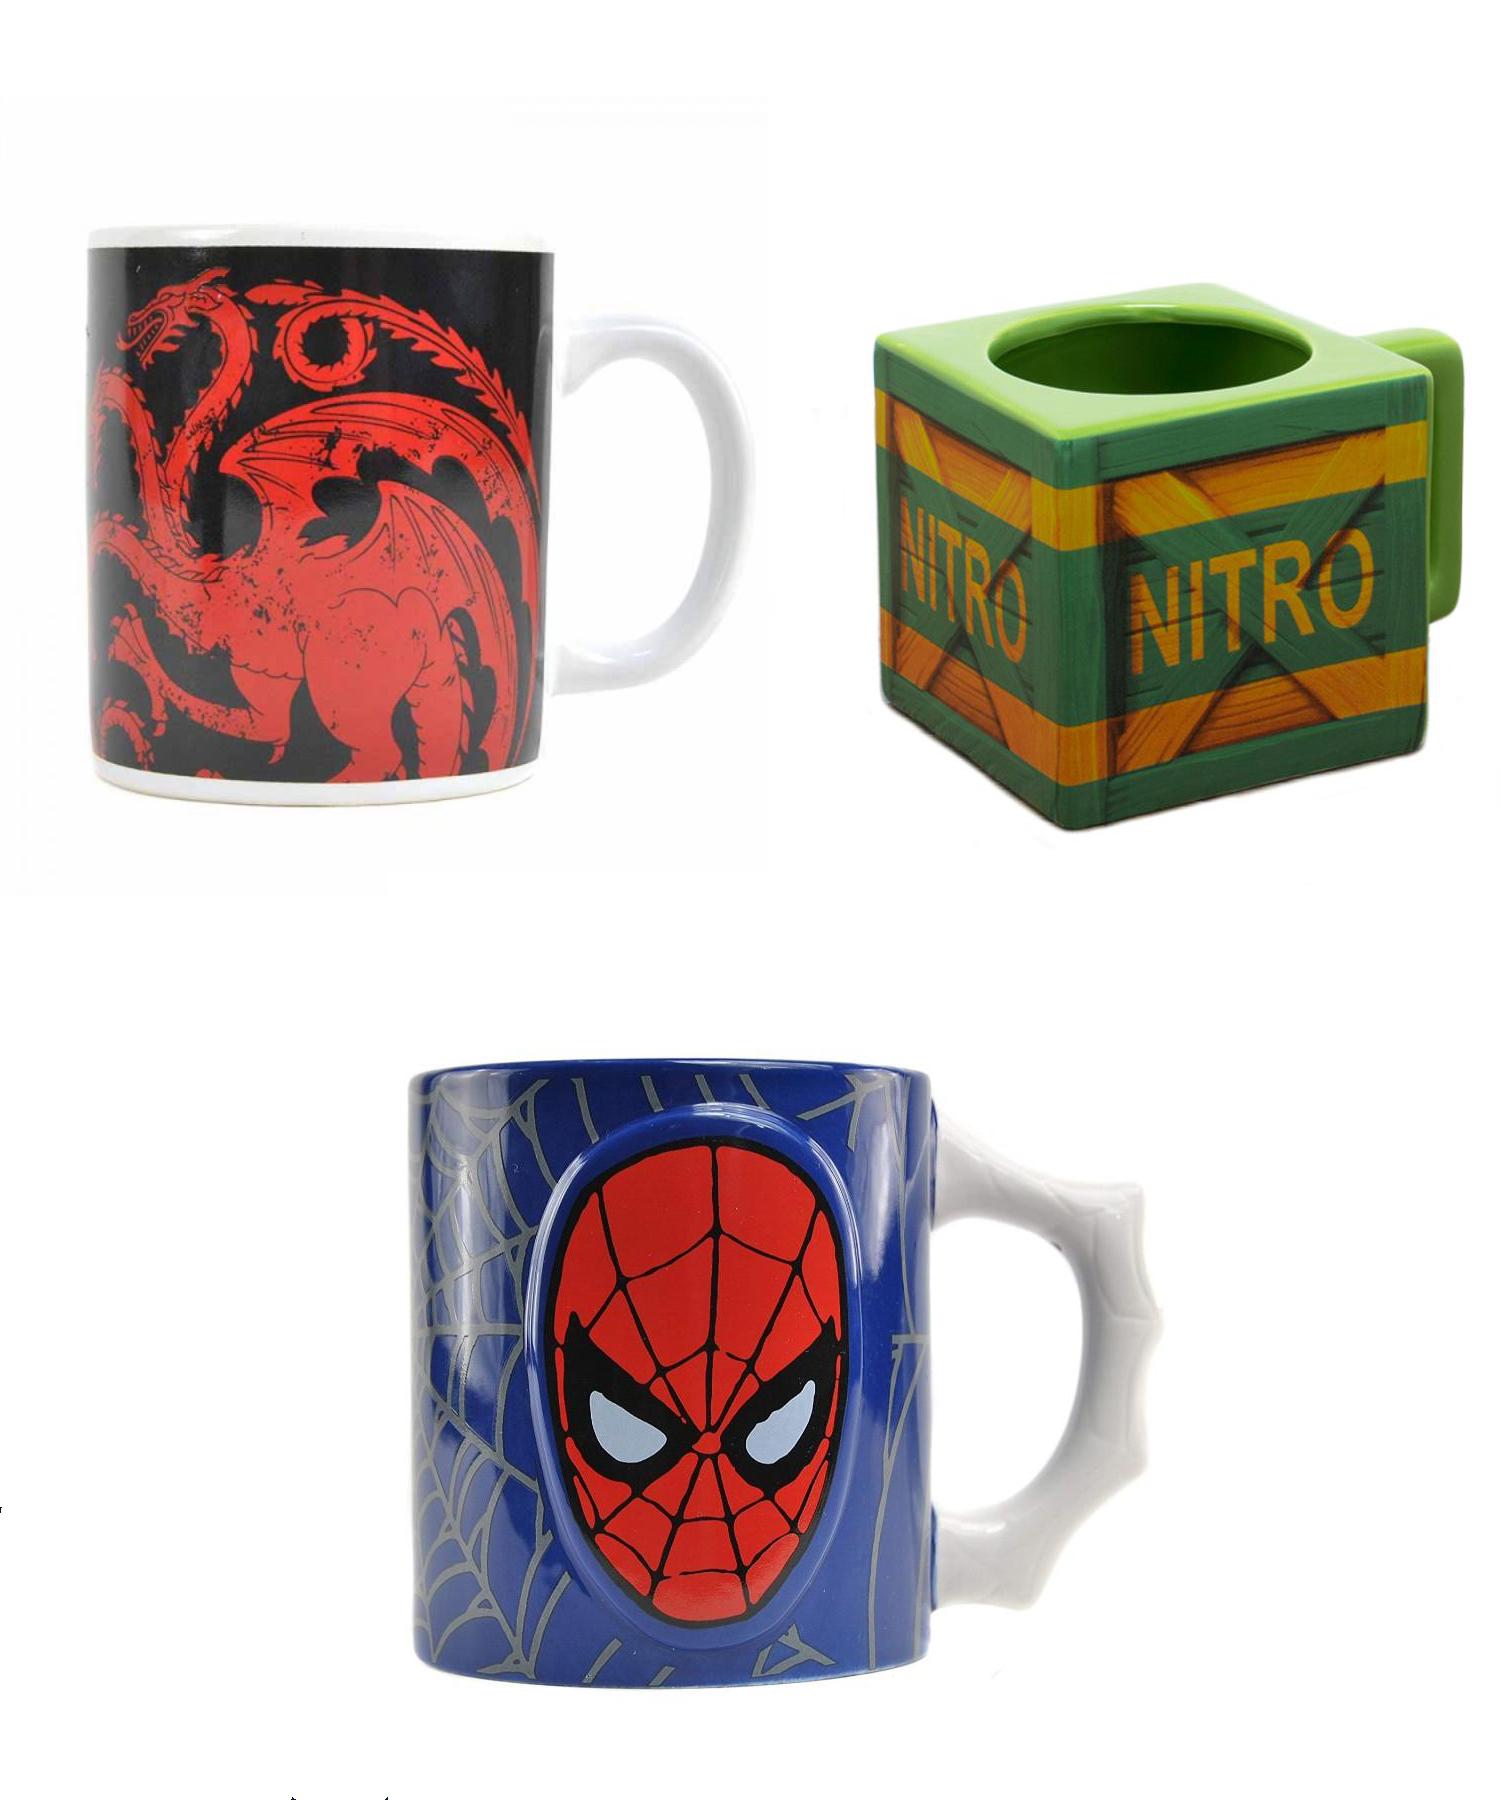 3 Mugs for £15 Delivered (Crash / Star Wars / GoT and more) @ Geek Store